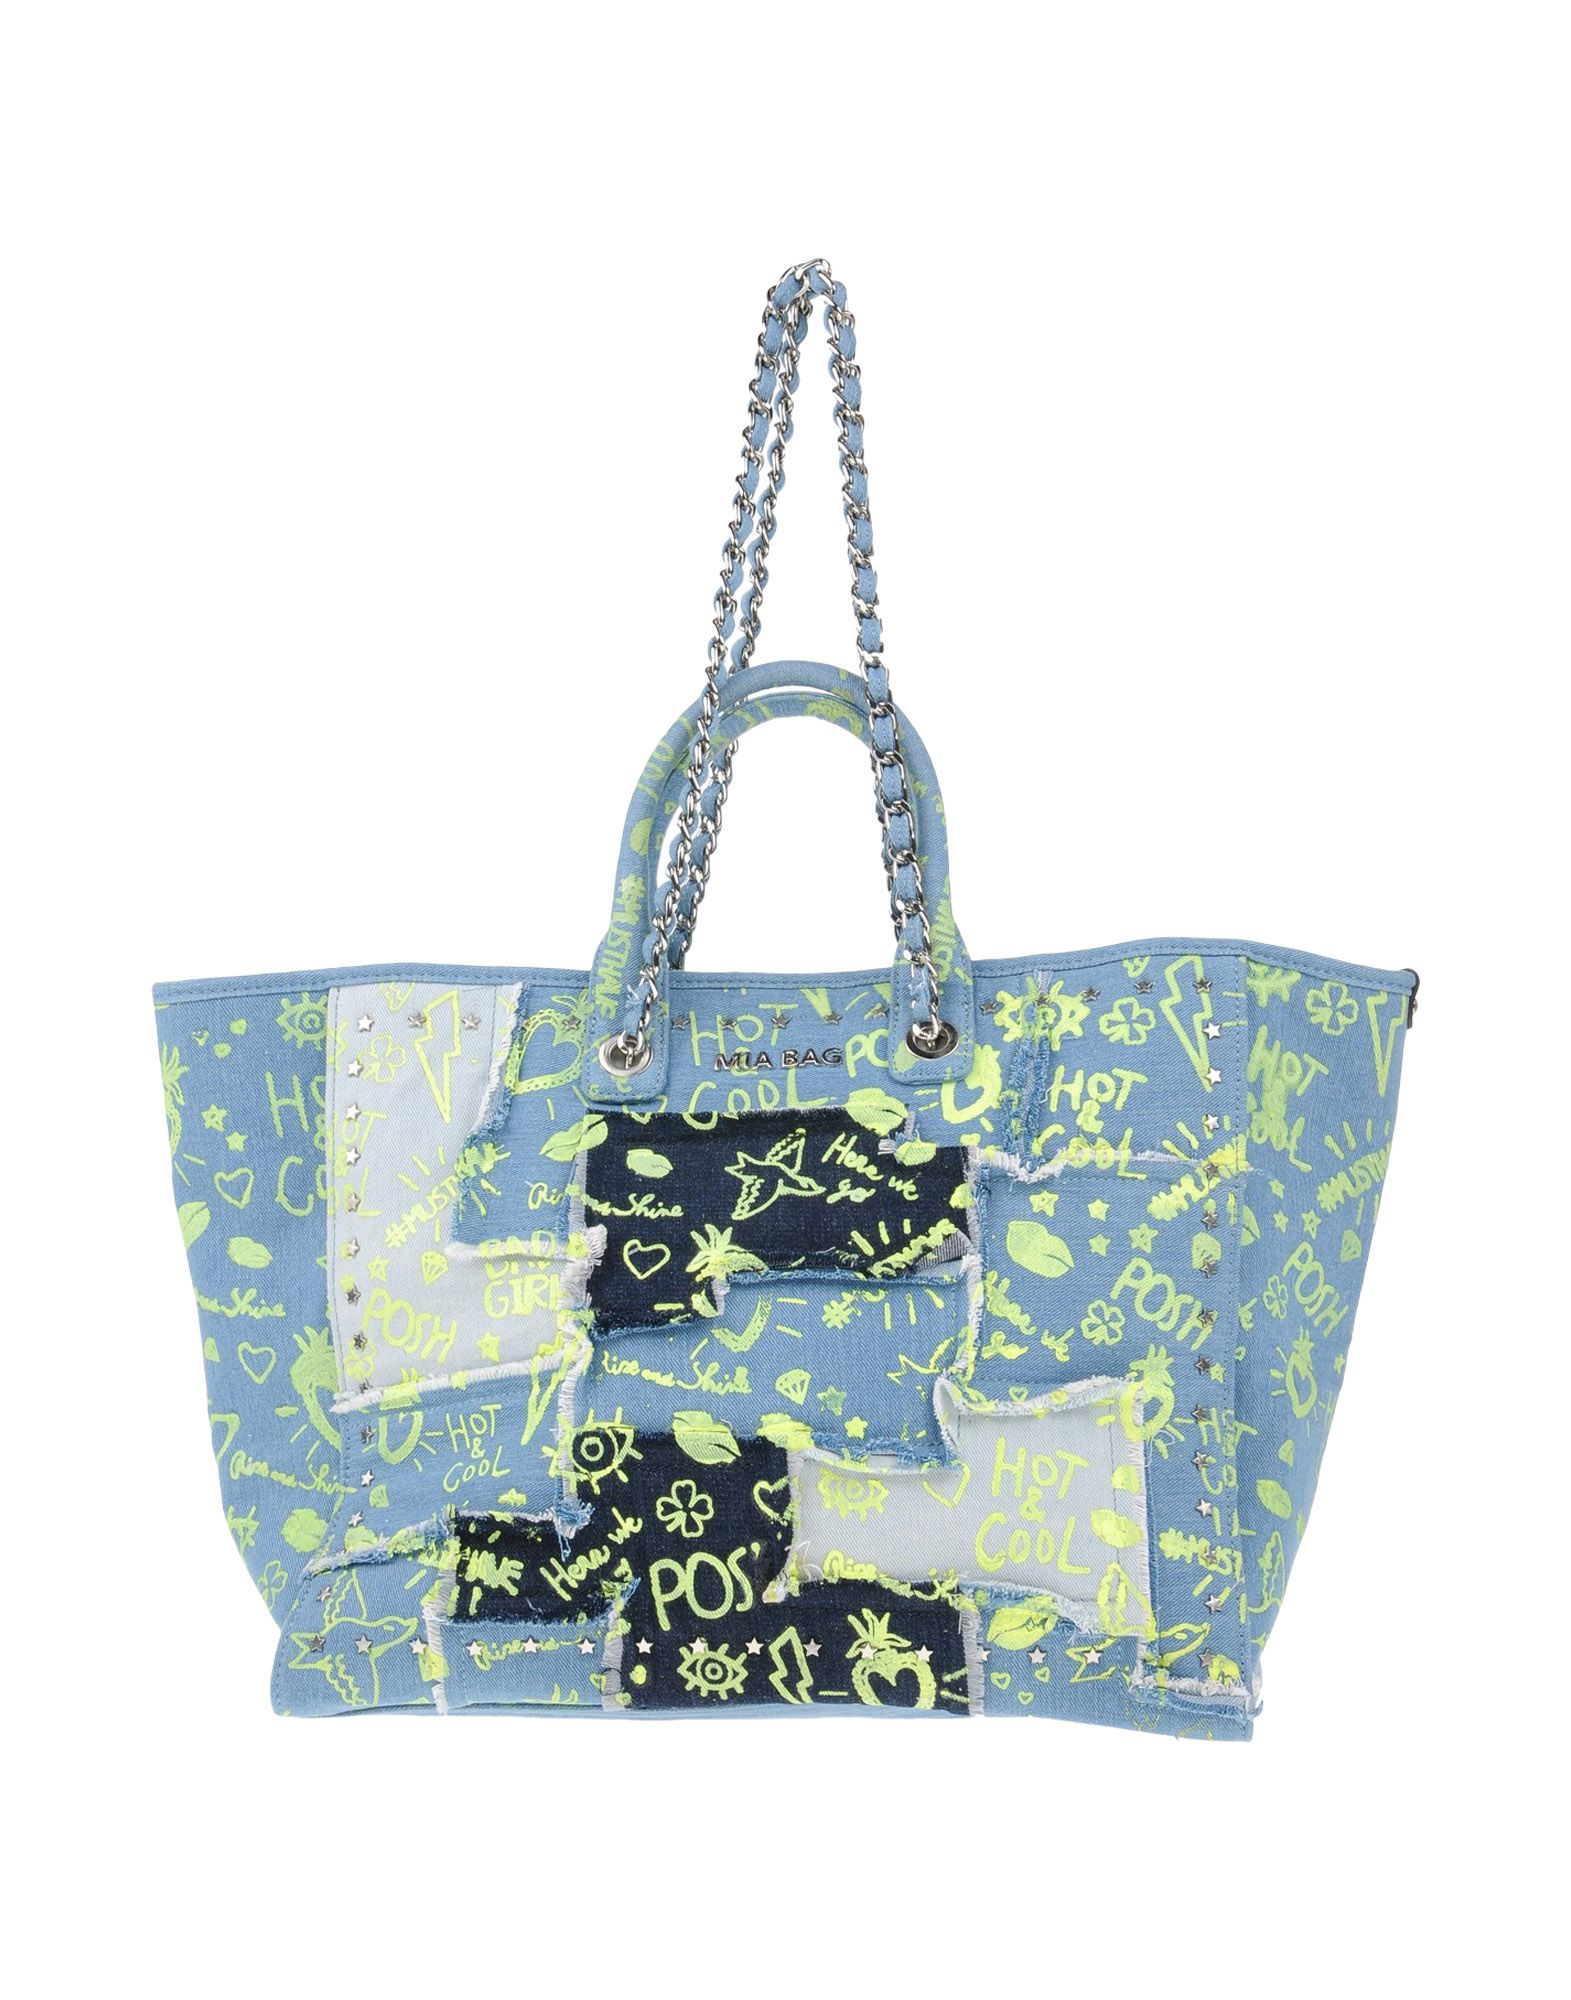 MIA BAG Сумка на руку mia bag большая сумка из текстиля